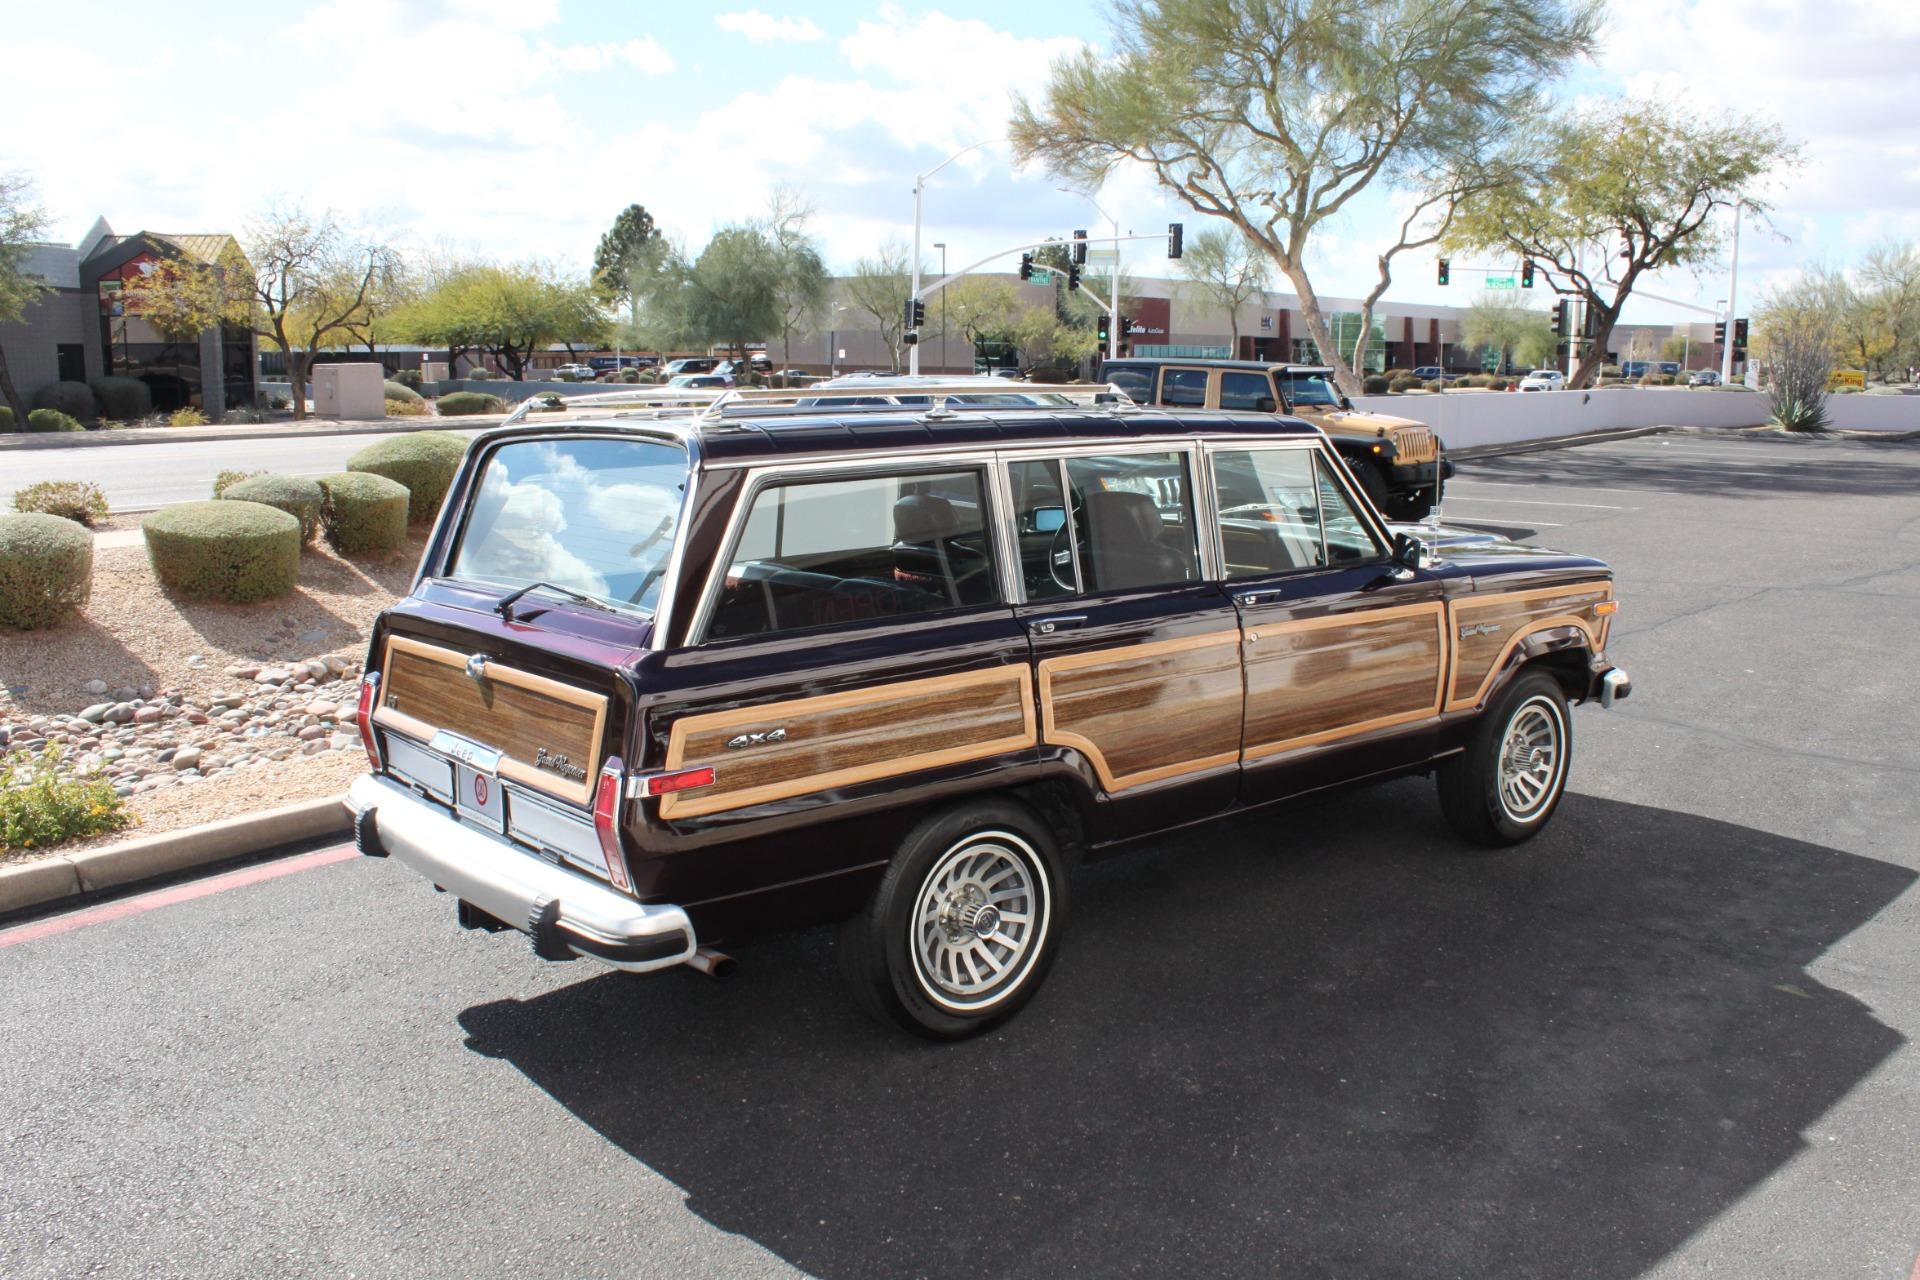 Used-1989-Jeep-Grand-Wagoneer-Fiat